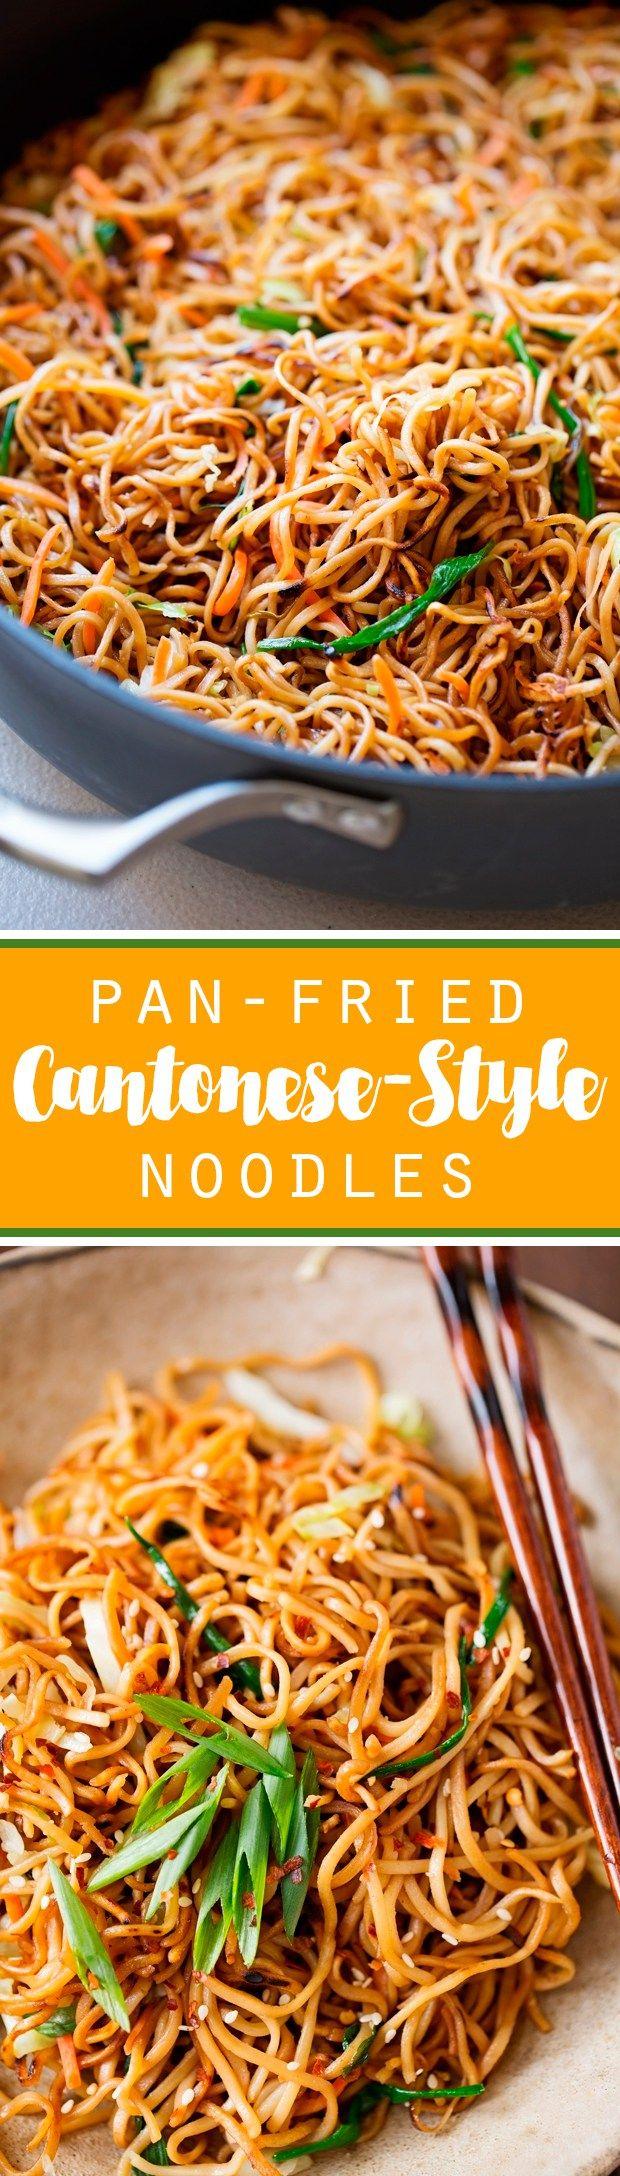 Cantonese-Style Pan-Fried Noodles Recipe | Little Spice Jar